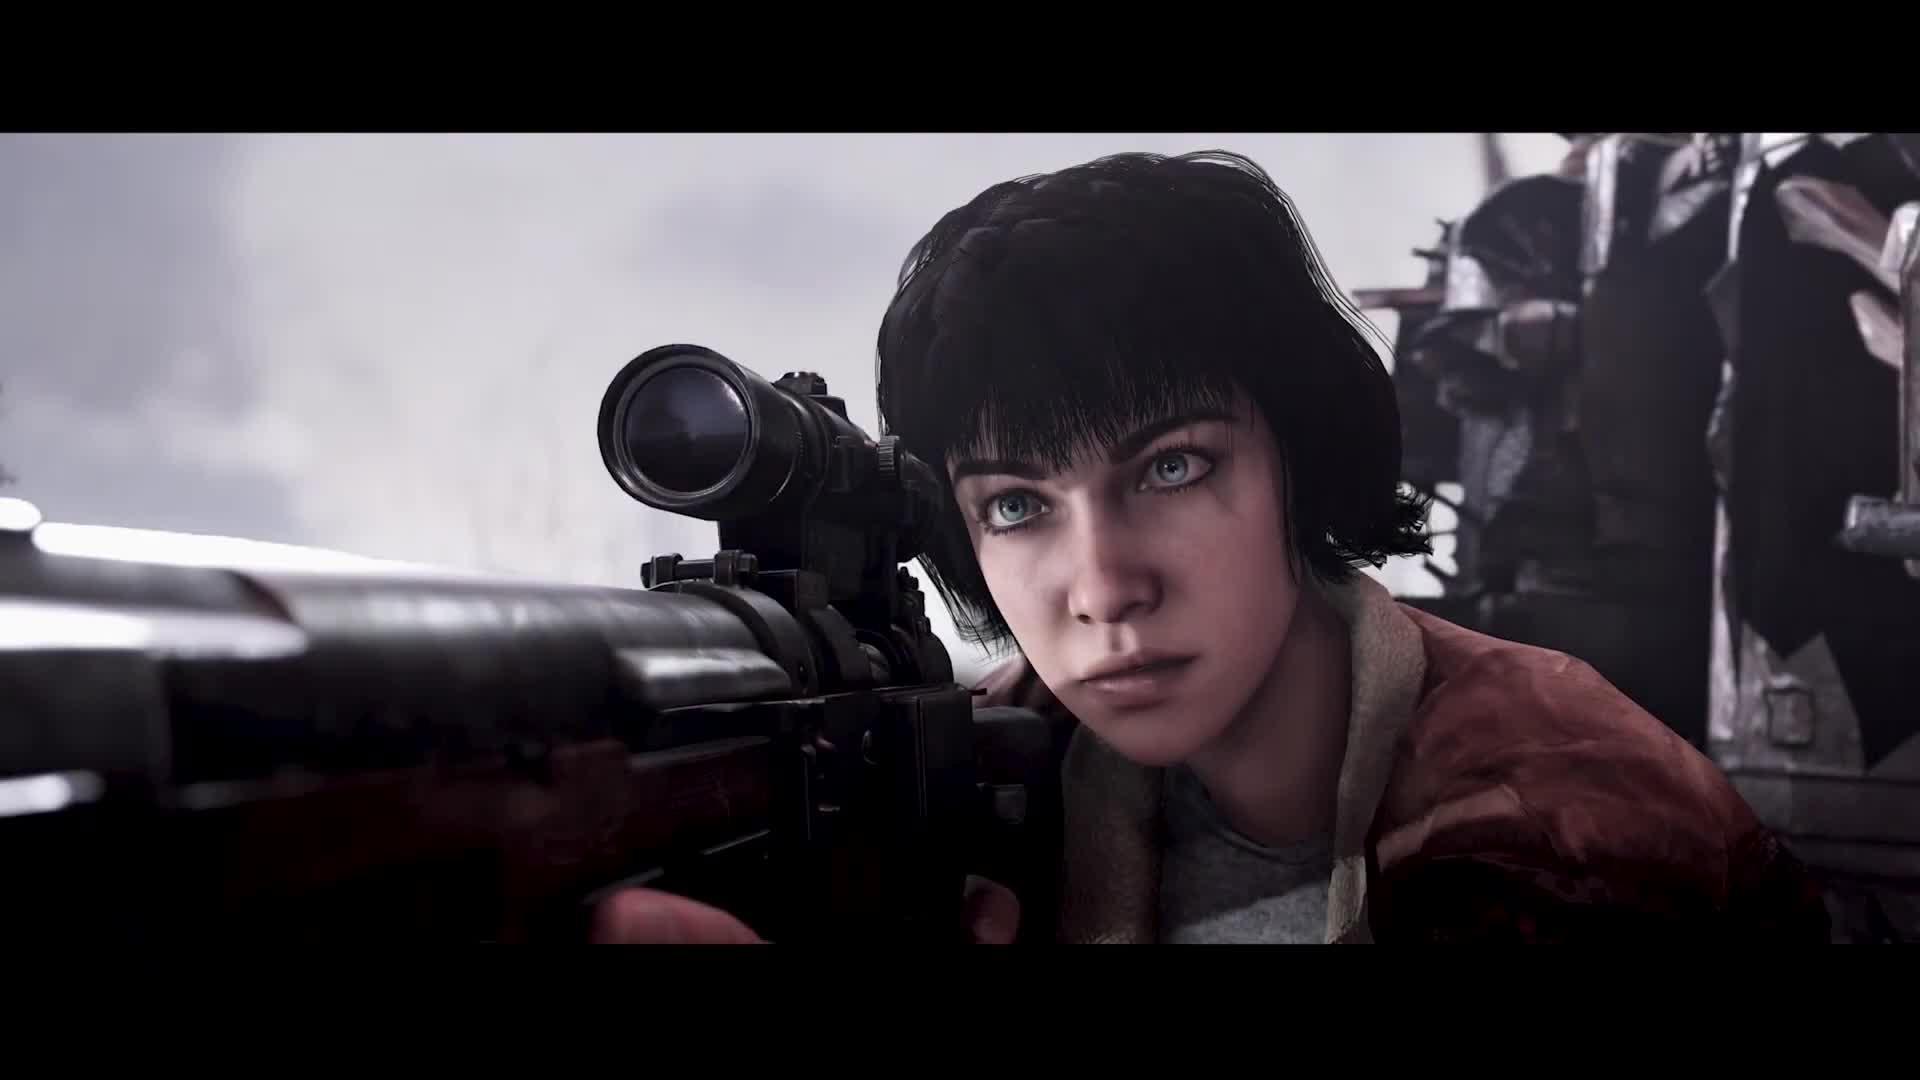 Trailer, Ego-Shooter, Bethesda, Bethesda Softworks, Wolfenstein, Wolfenstein: Youngblood, Youngblood